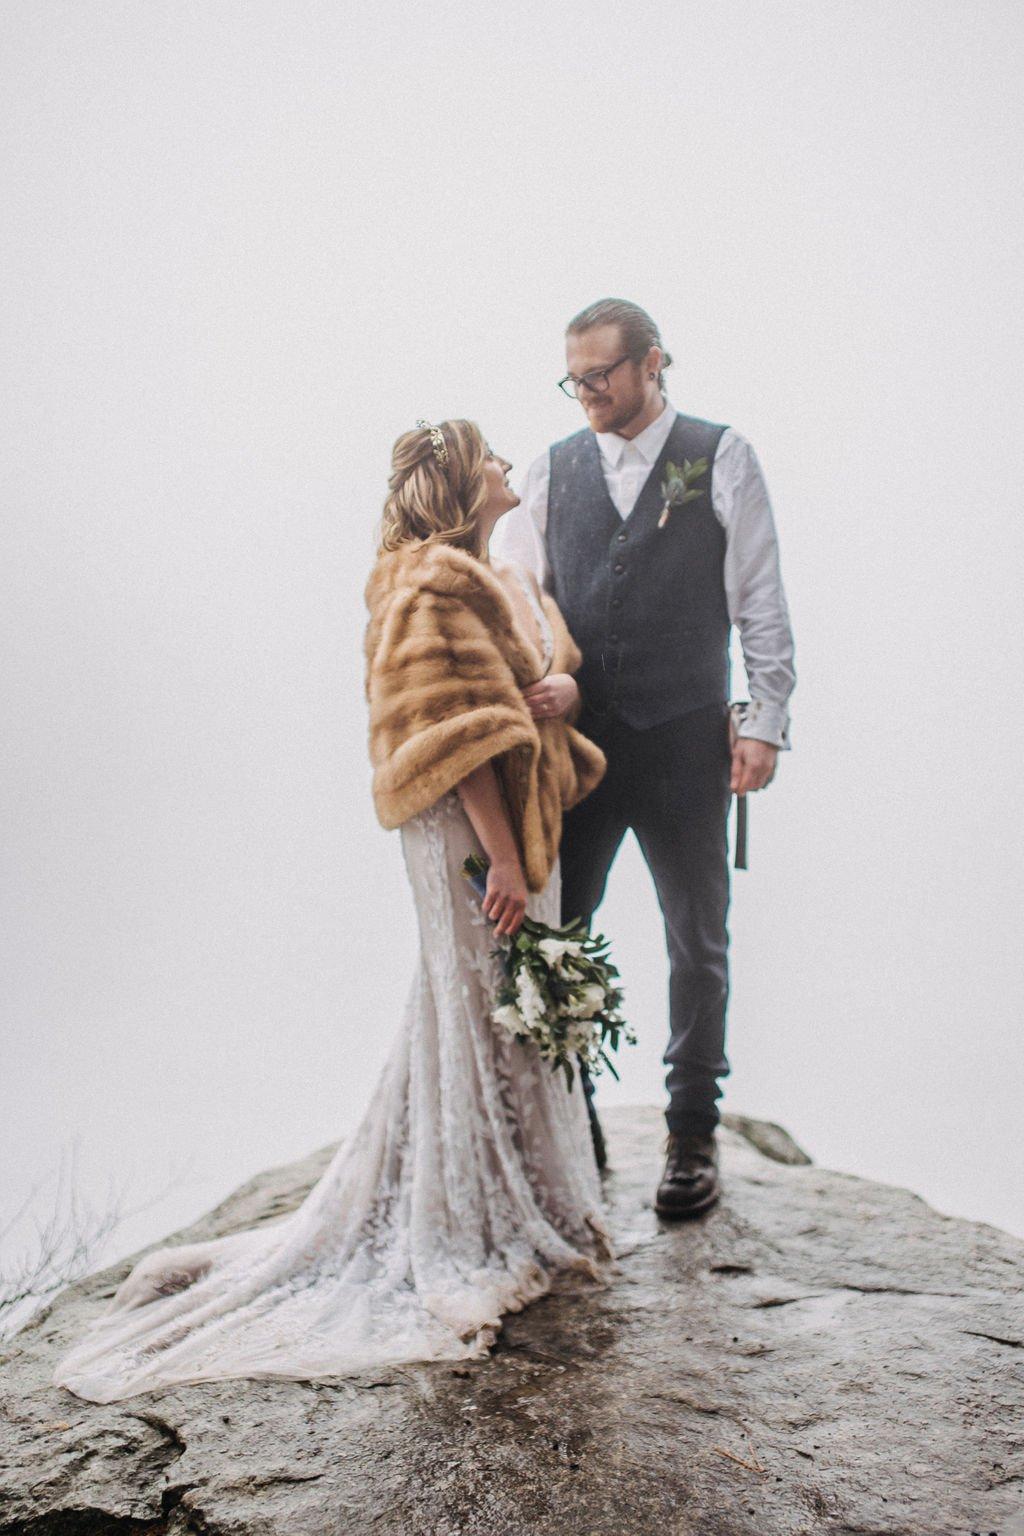 Minnewaska State Park elopement